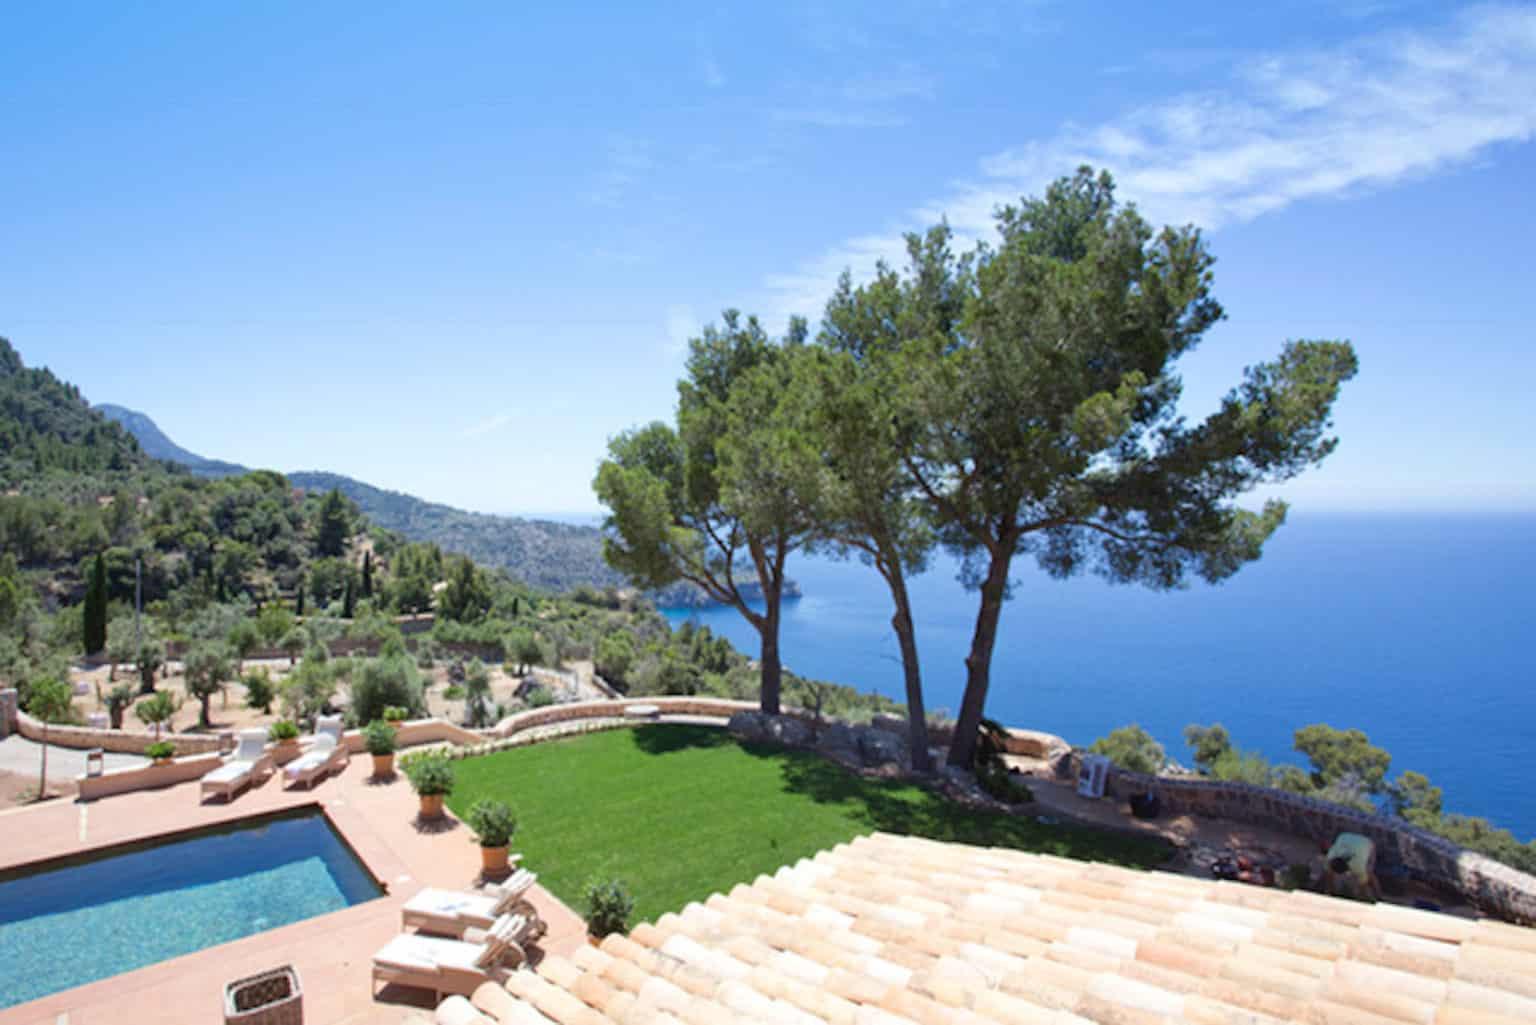 Rental Mallorca - 4 Bedrooms - Balearic Bliss - Villa Rafaella - sea view